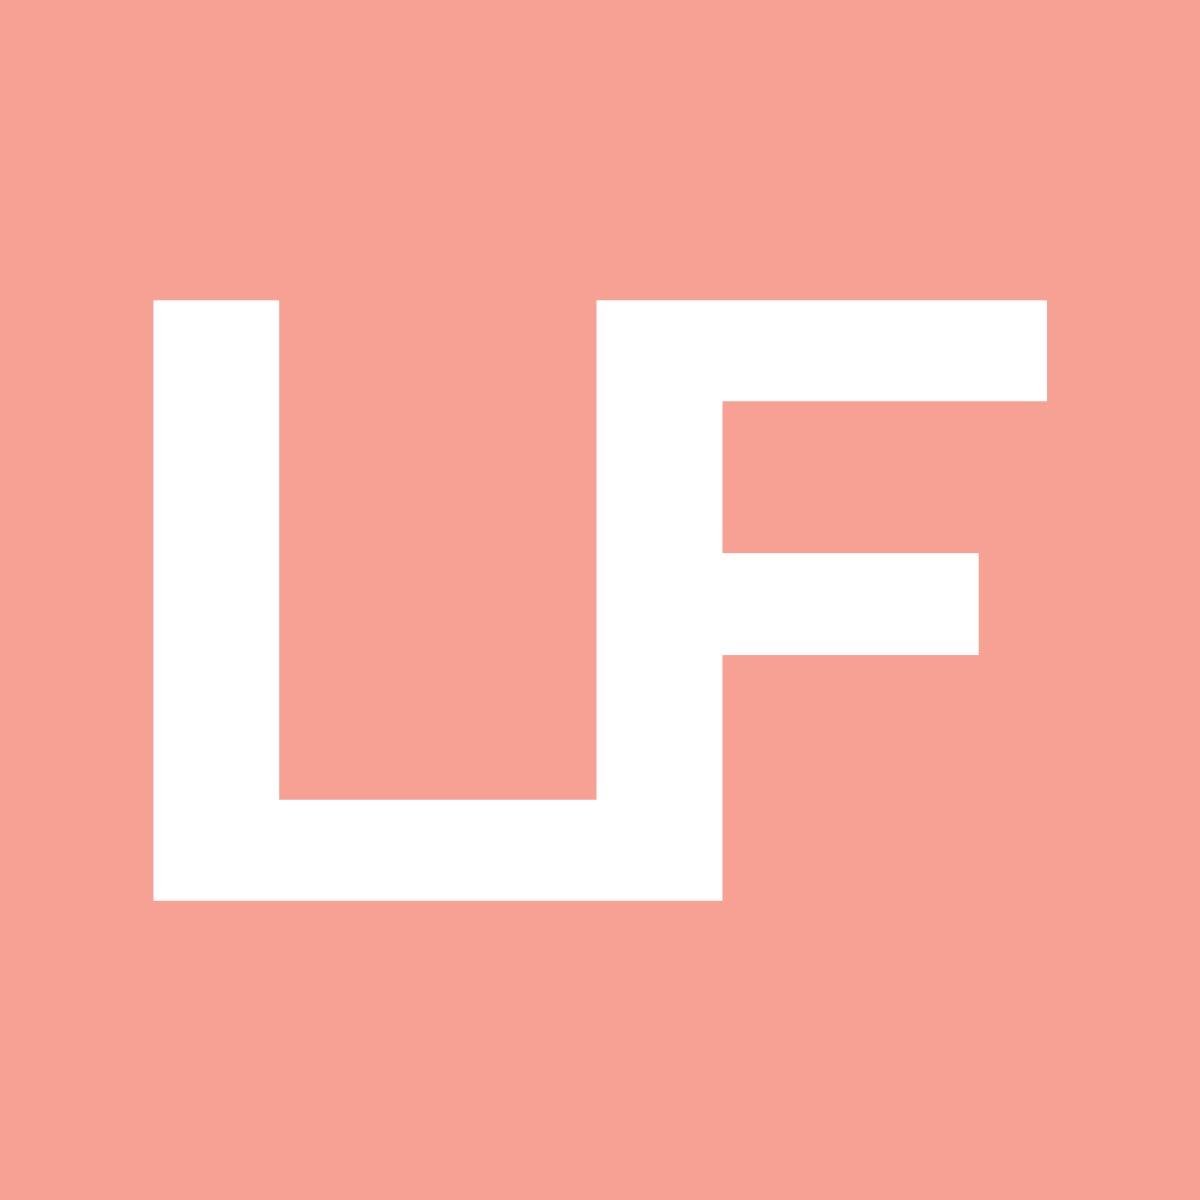 LOOKFANTASTIC 中文站:满减活动